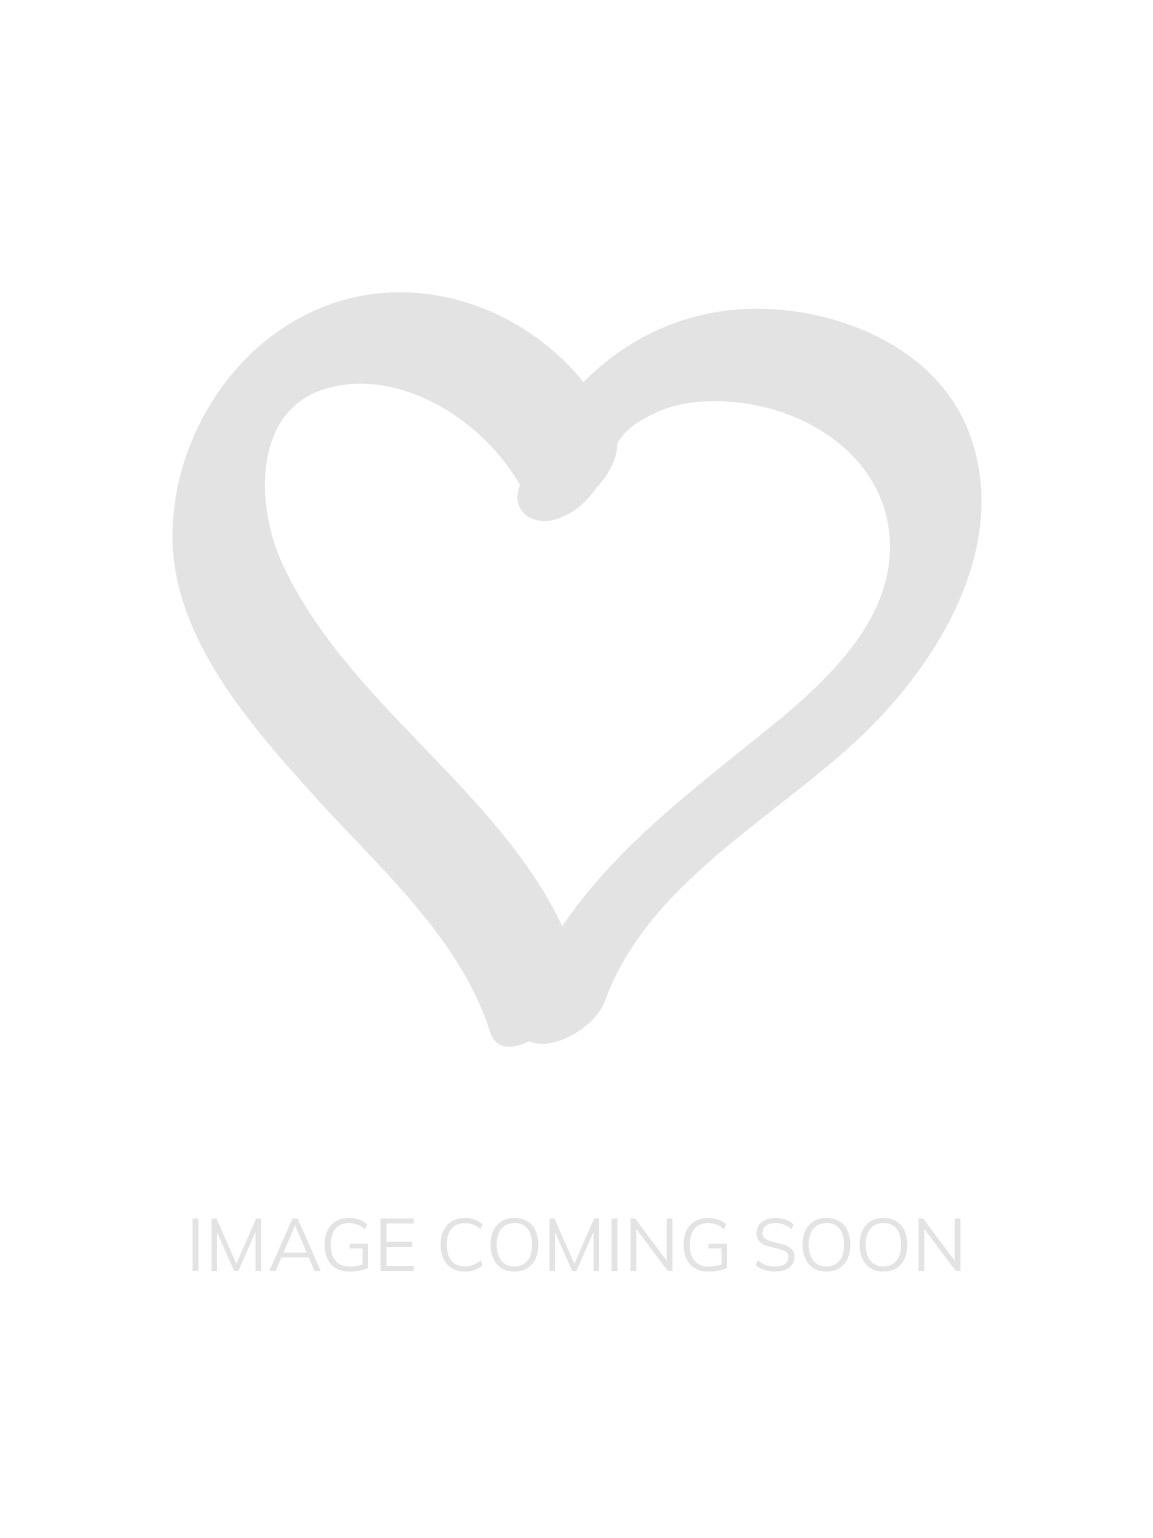 47958b4053c9a Mamba Halterneck Bikini Top - Multi | Lingerie Outlet Store